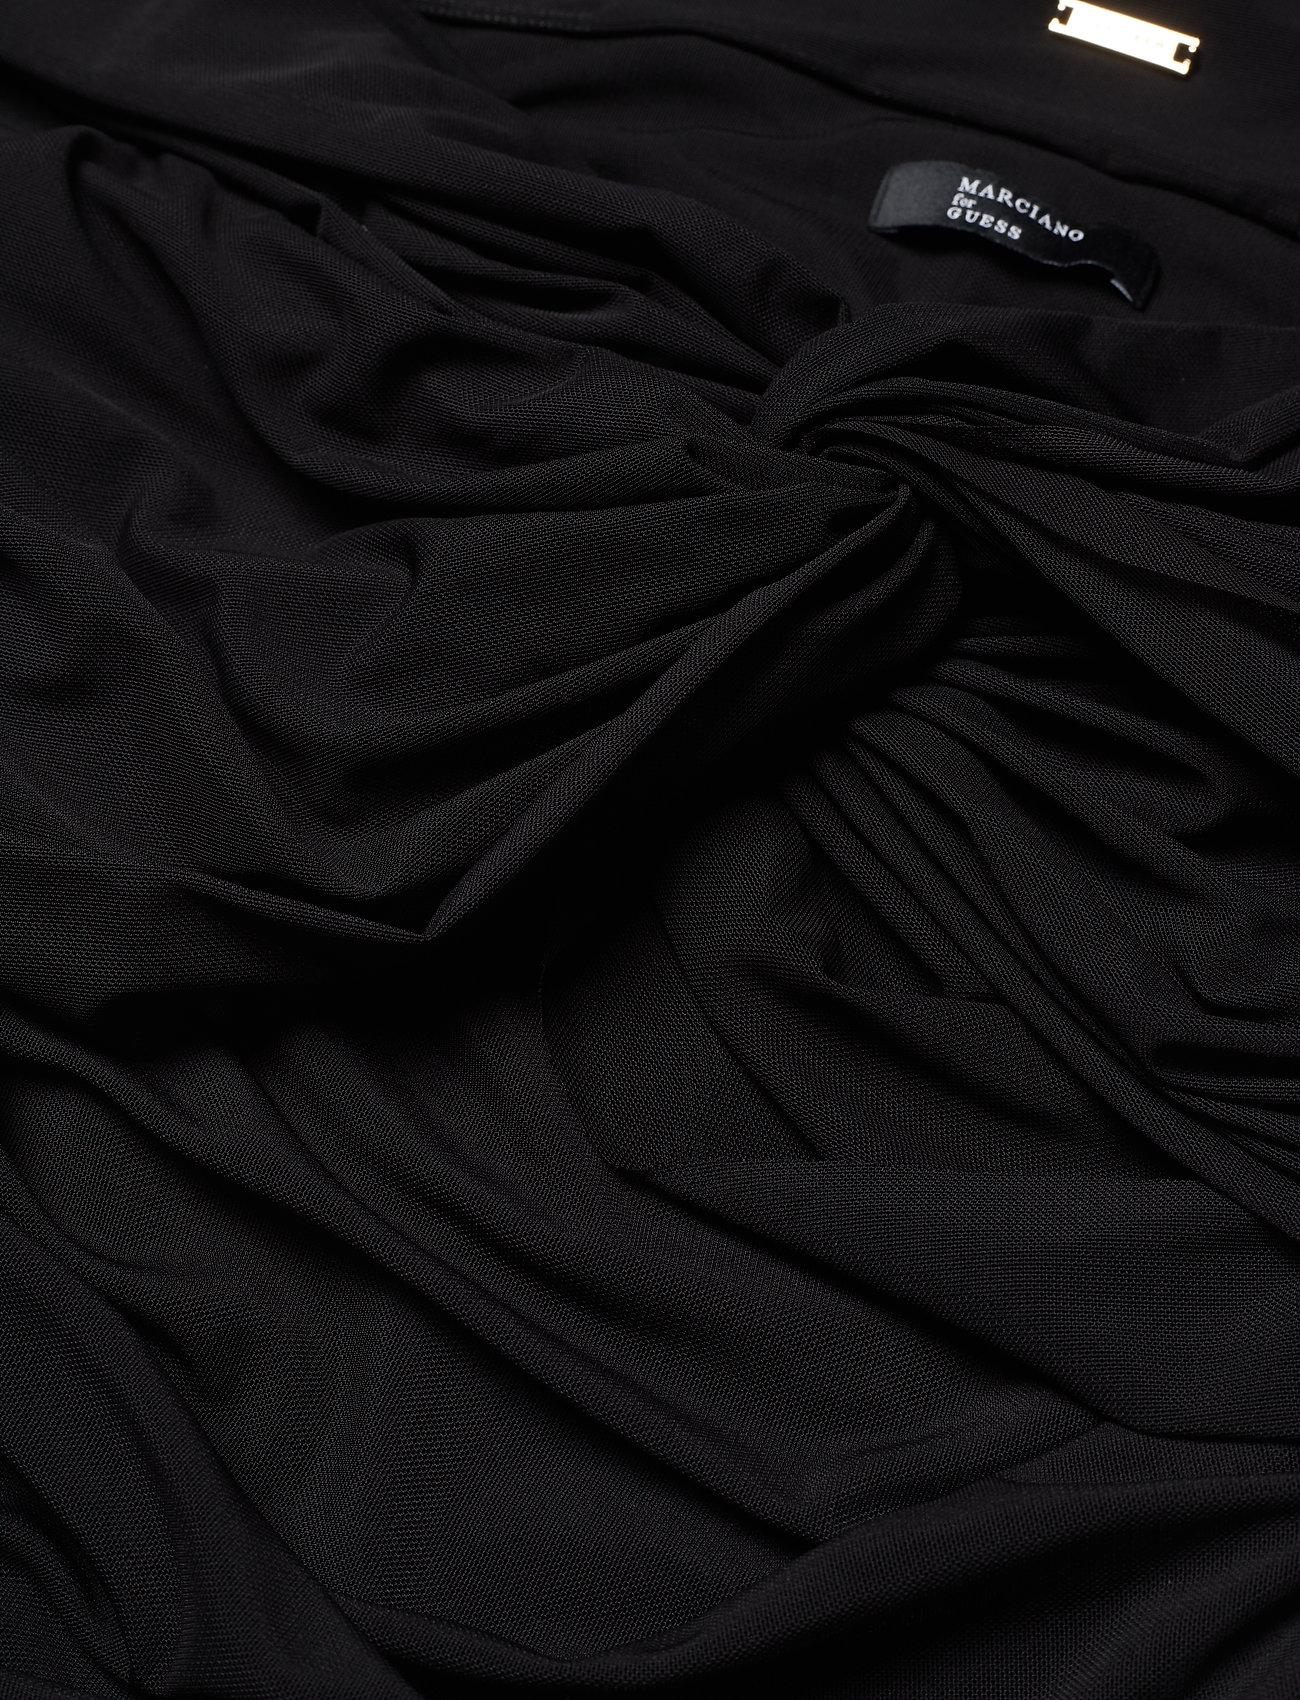 By Bodysuitjet Guess Mesh Black A996Marciano Nadine JcTlFK1